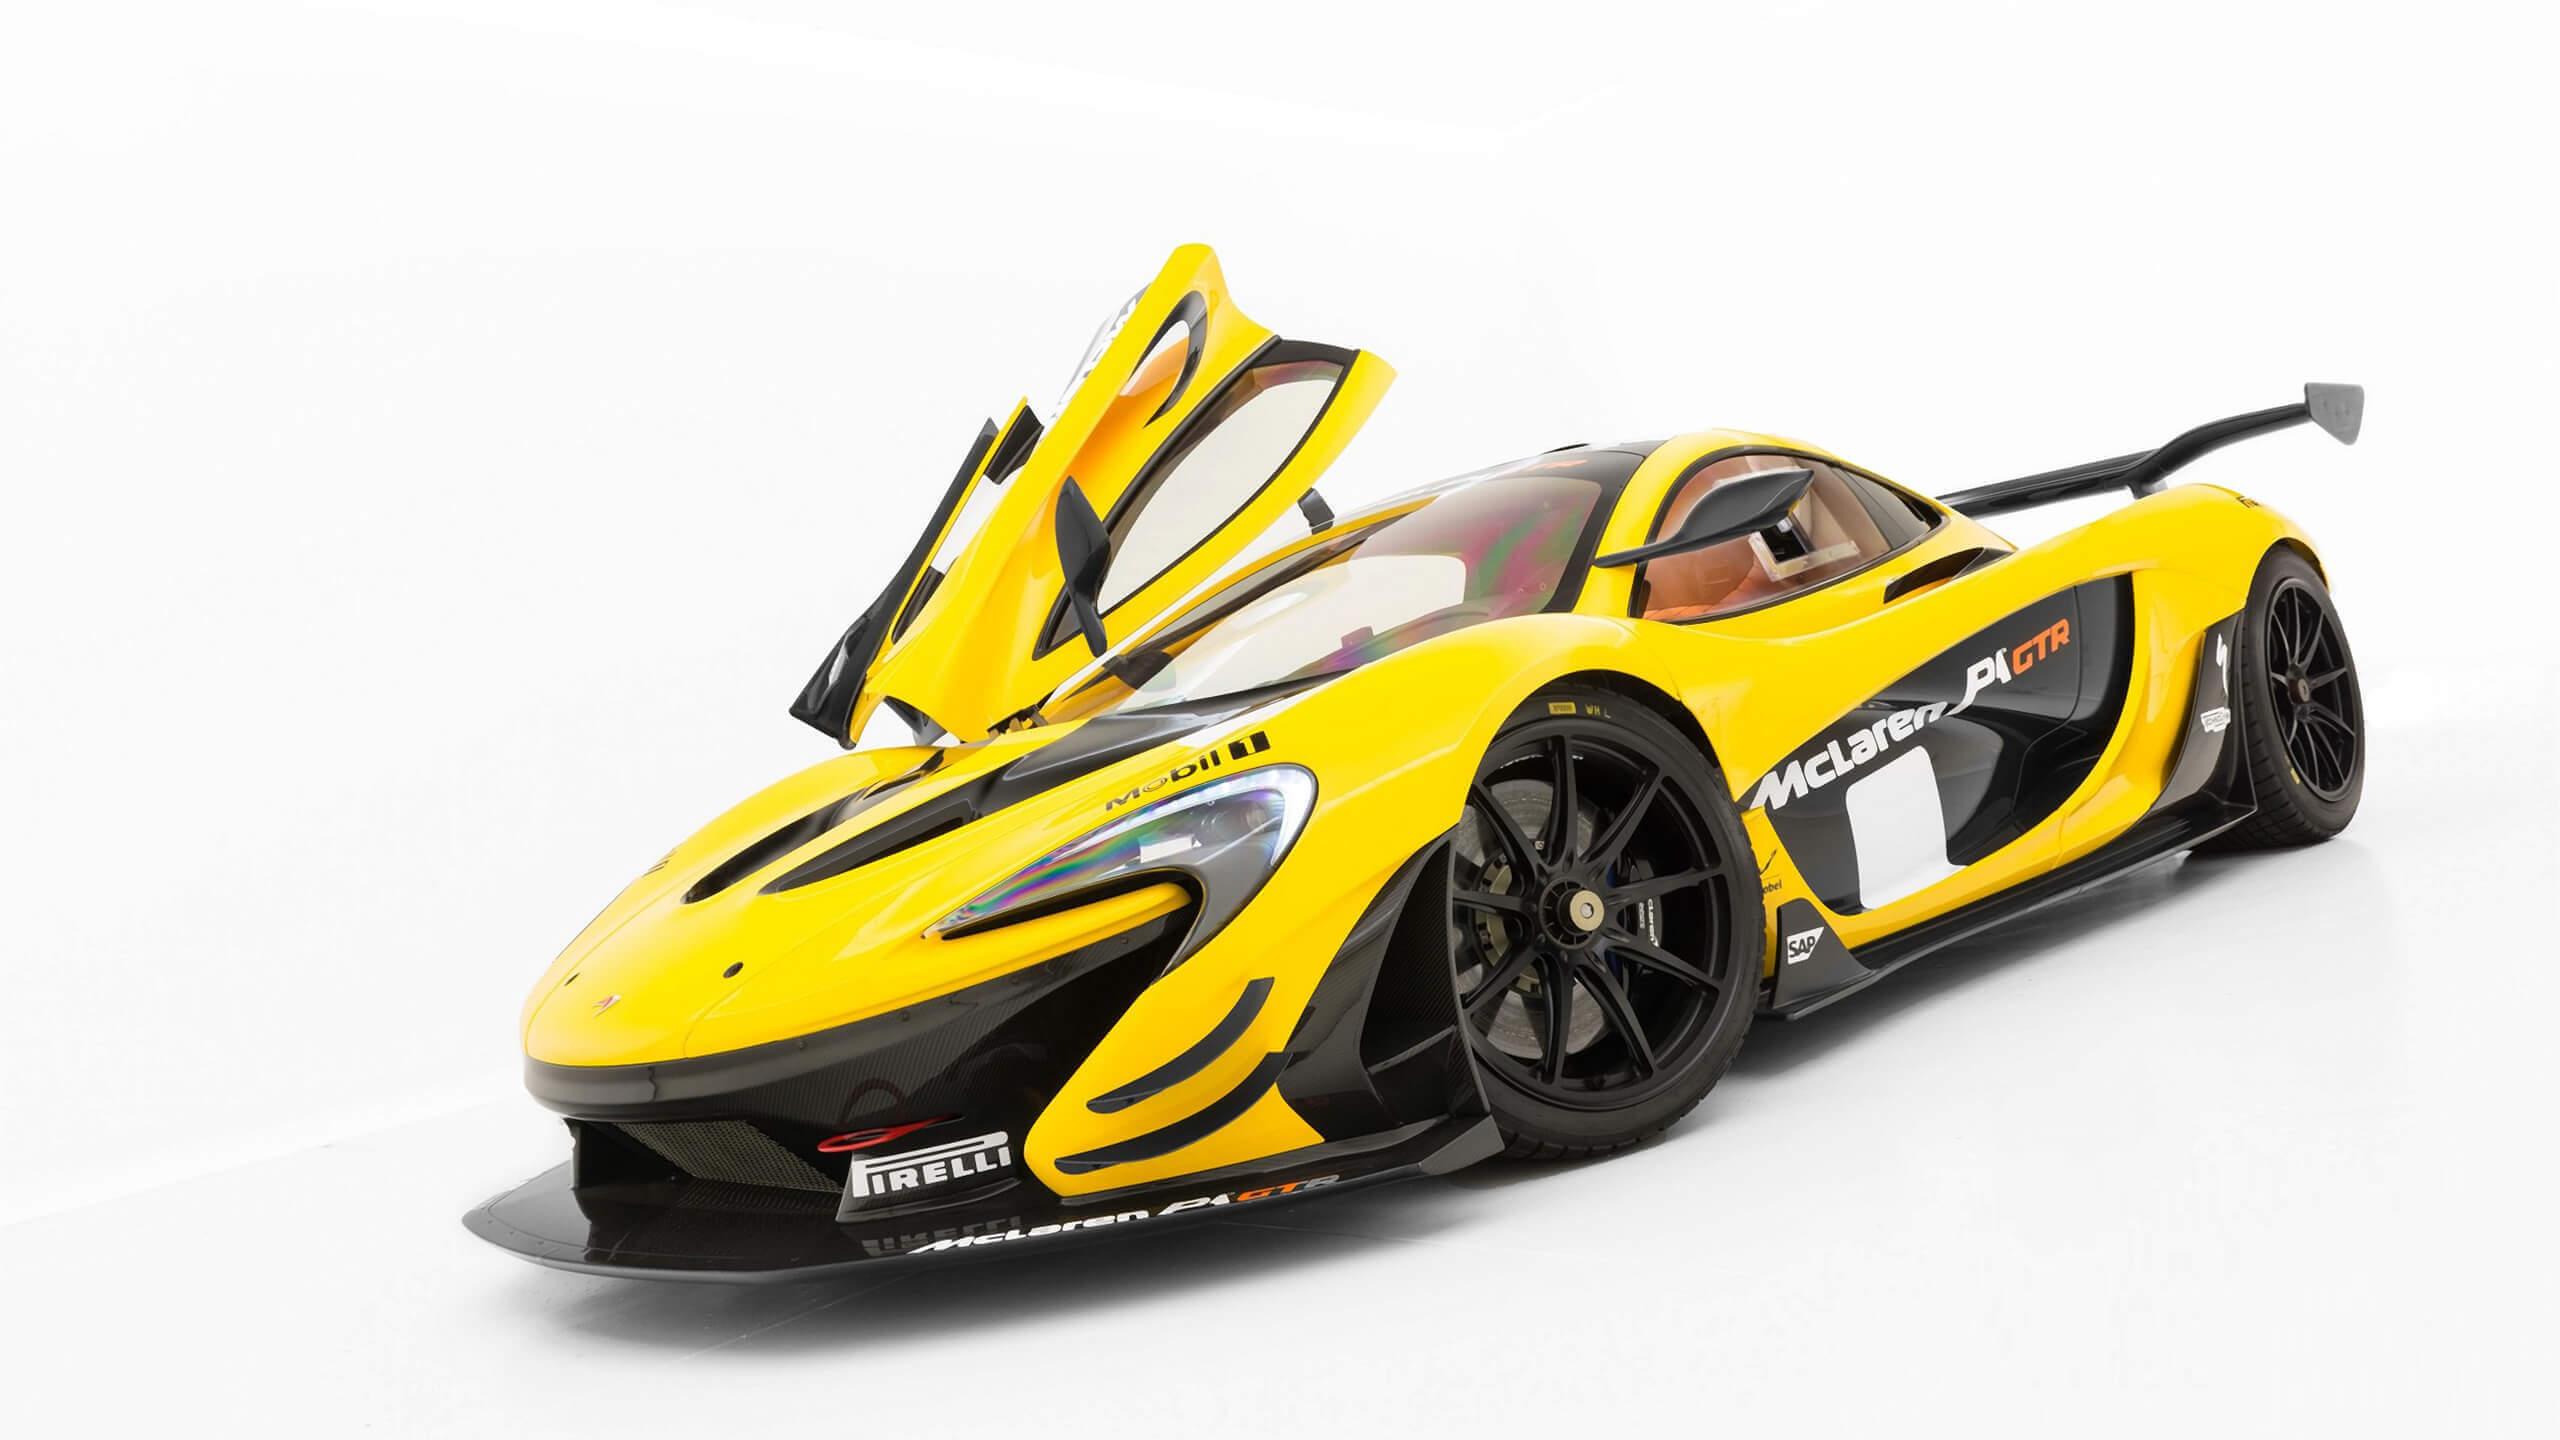 Street-legal-McLaren-P1-GTR-for-sale-1